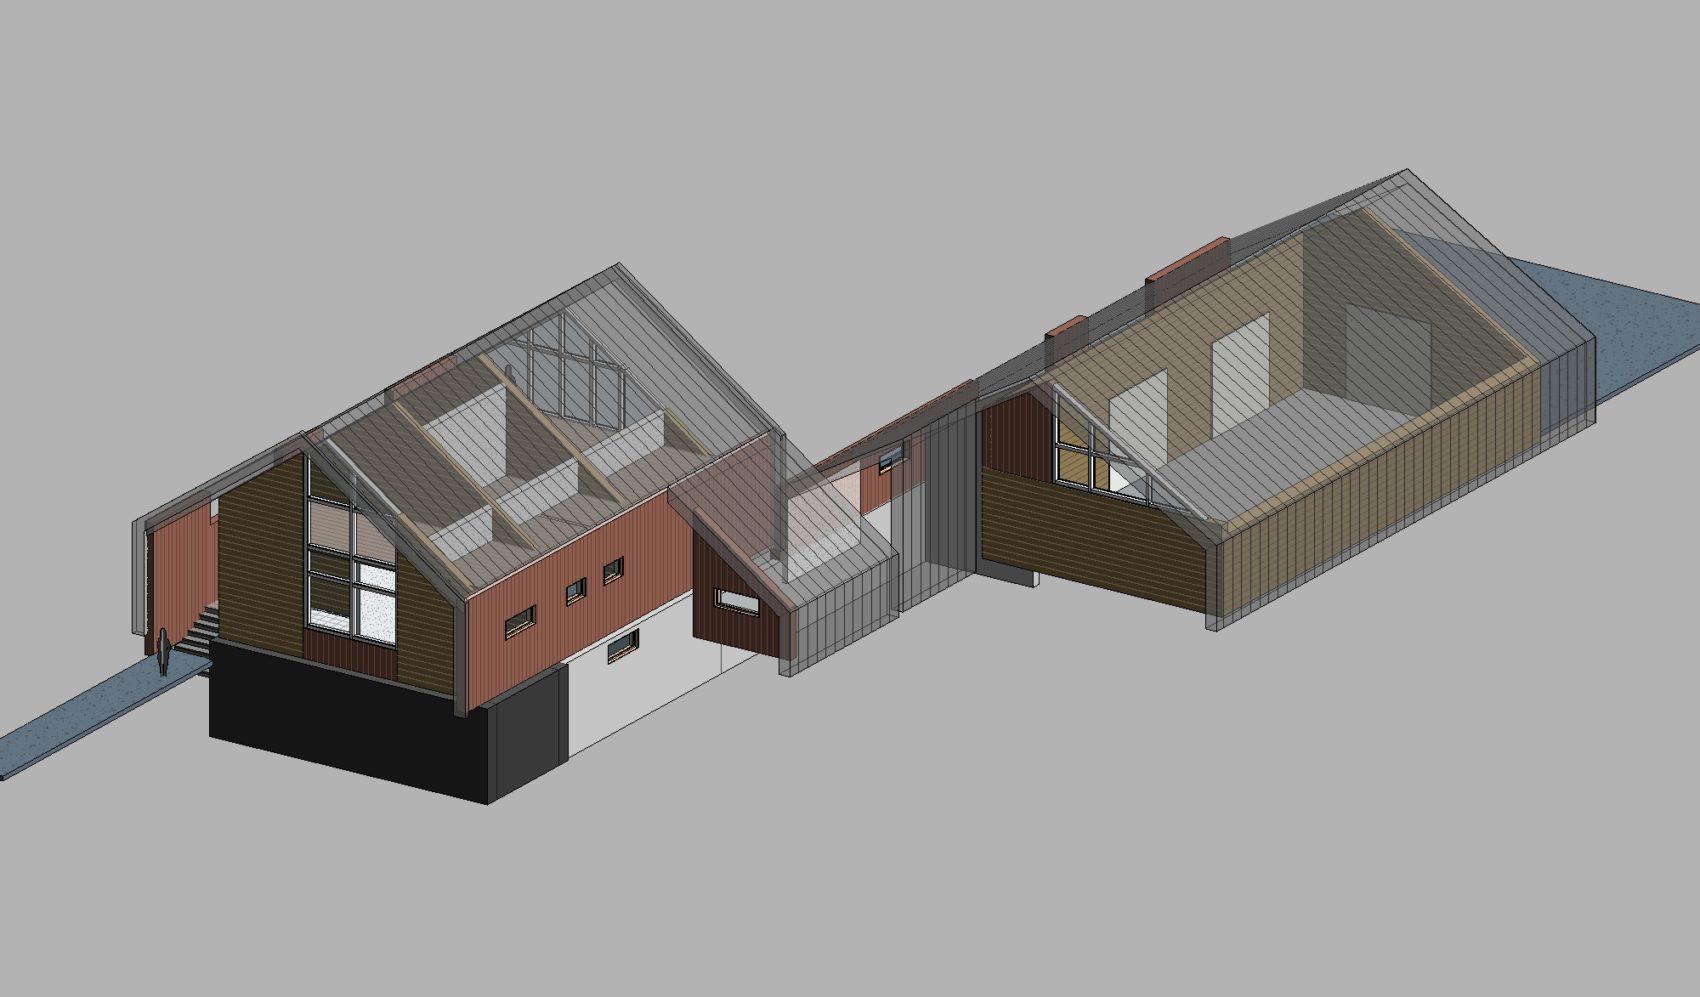 ферма_проект архитектора Никитина